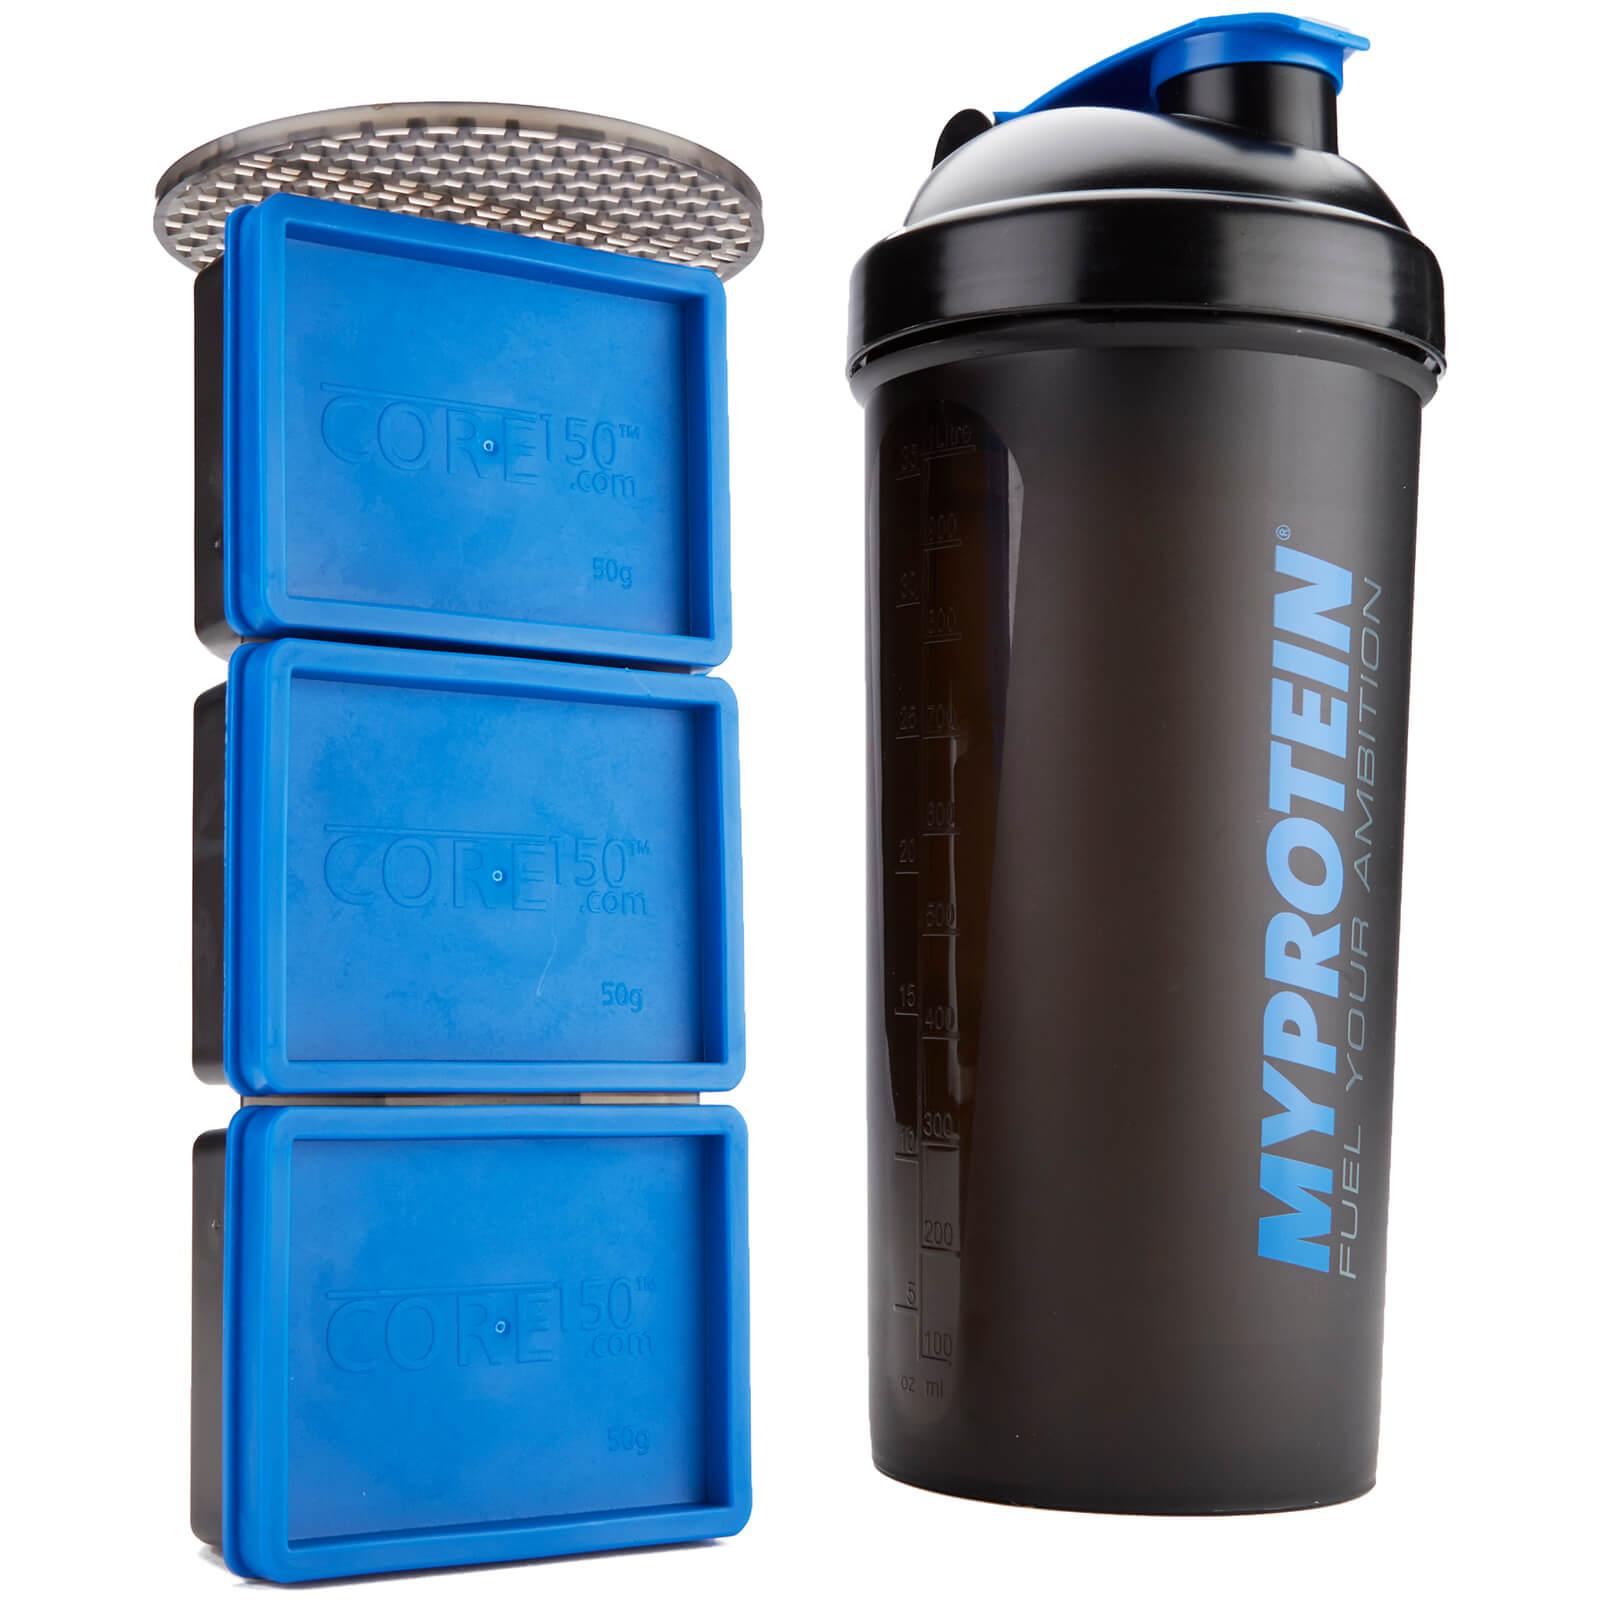 Protein Shaker Ne Kadar: Shaker Myprotein CORE 150 - Negru